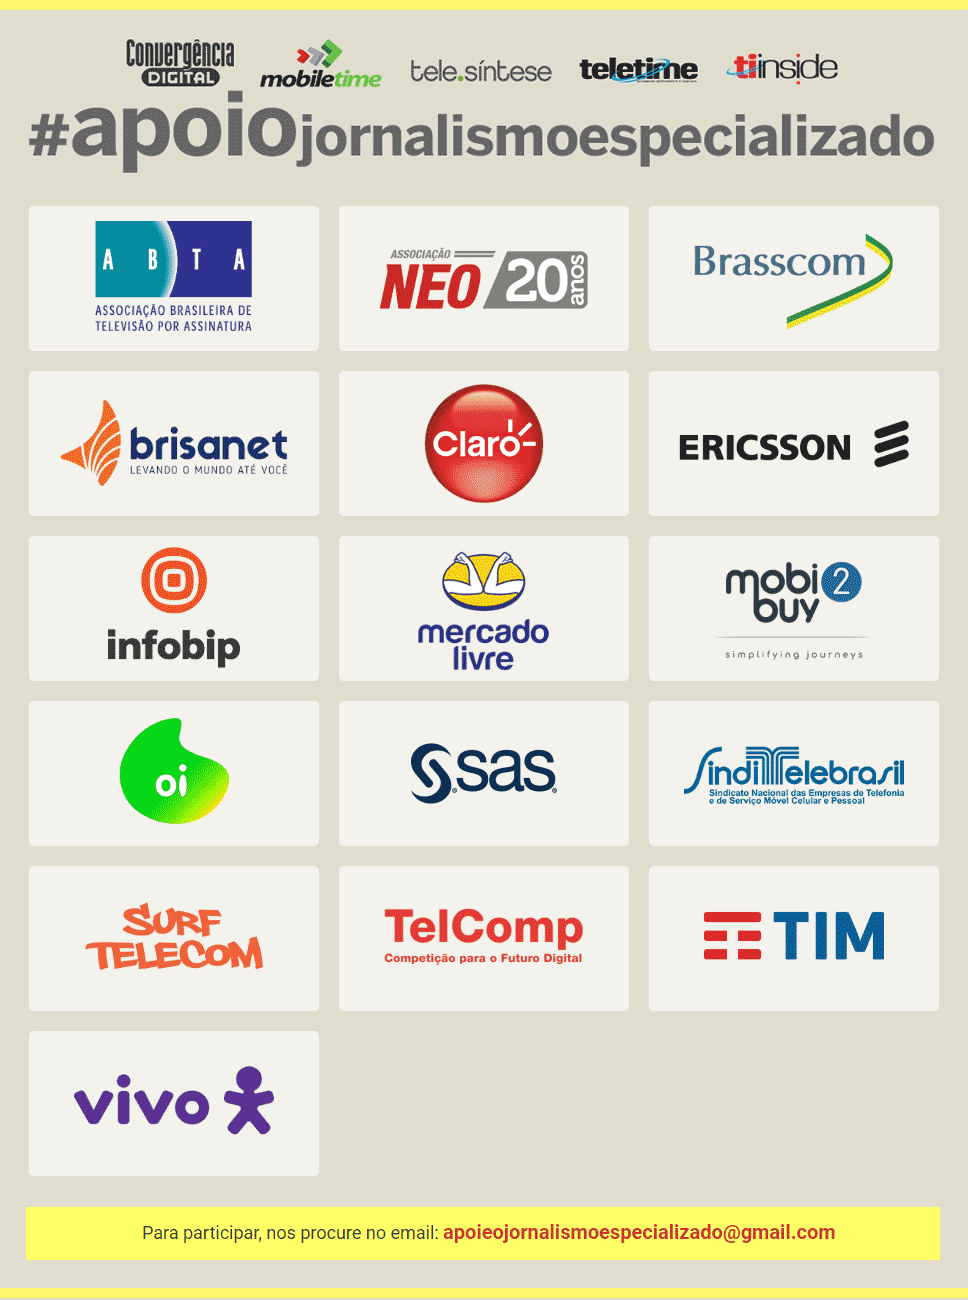 Apoio jornalismo especializado : Convergência Digital - Mobile Time - Tele.Síntese - Teletime - TI Inside